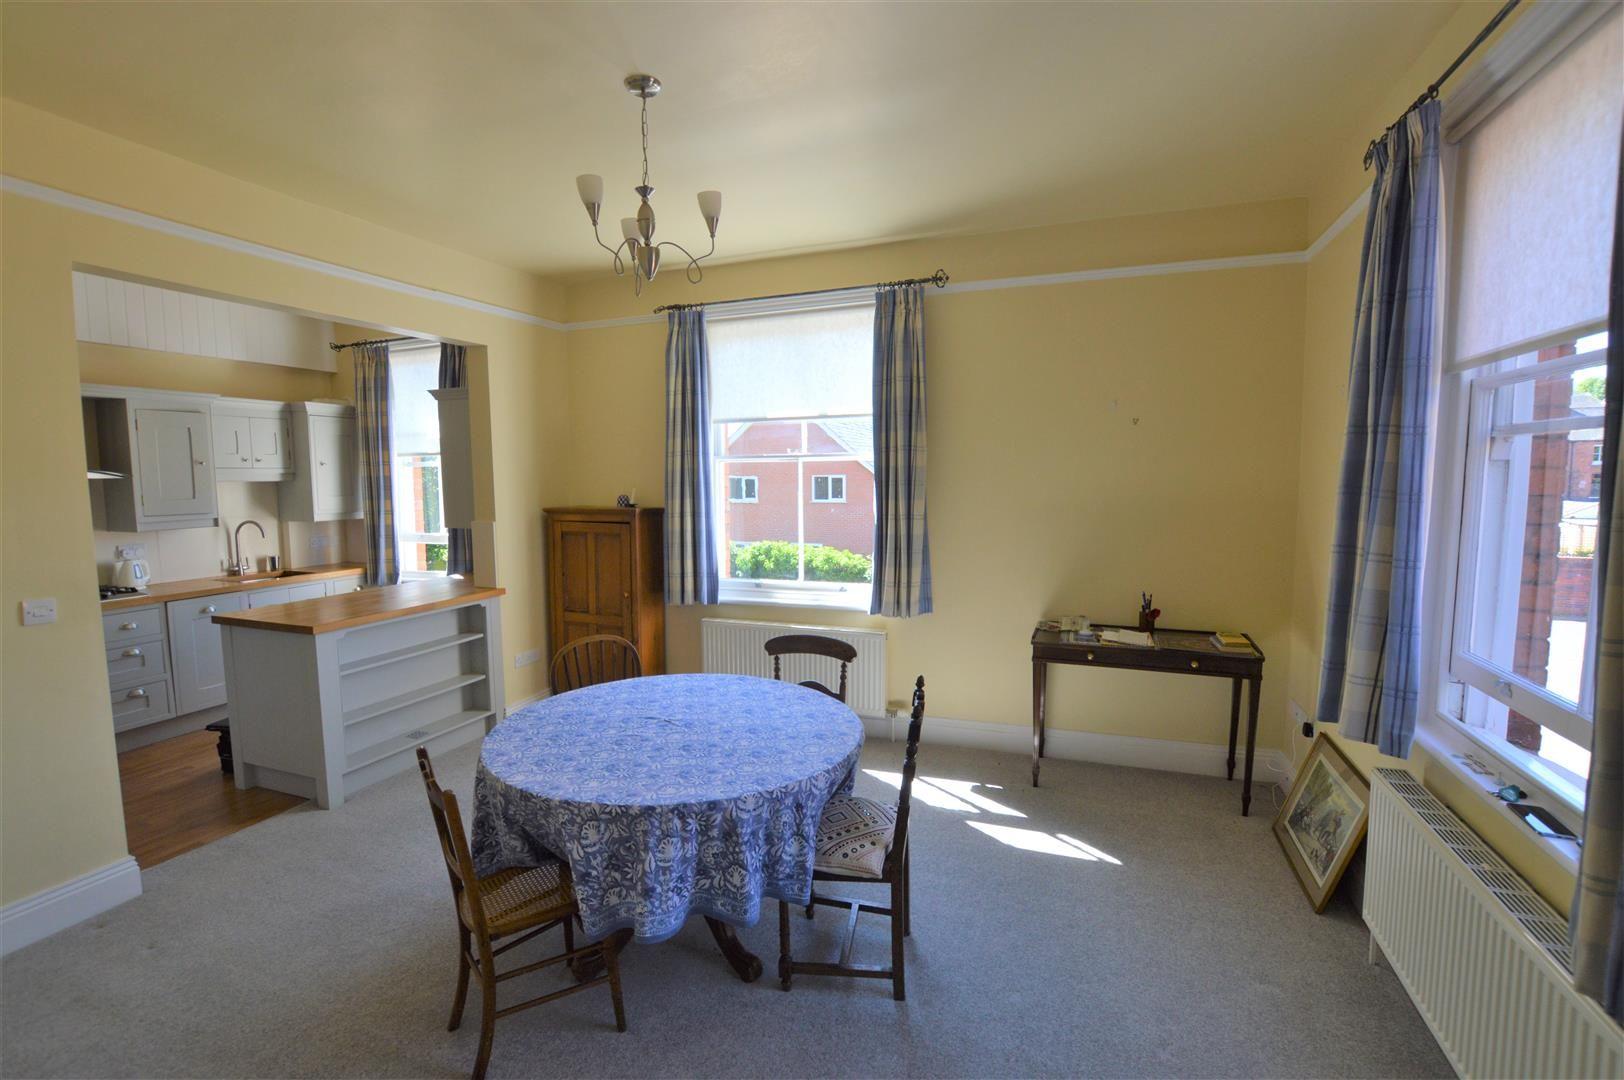 4 bed semi-detached for sale in Etnam Street, Leominster  - Property Image 3